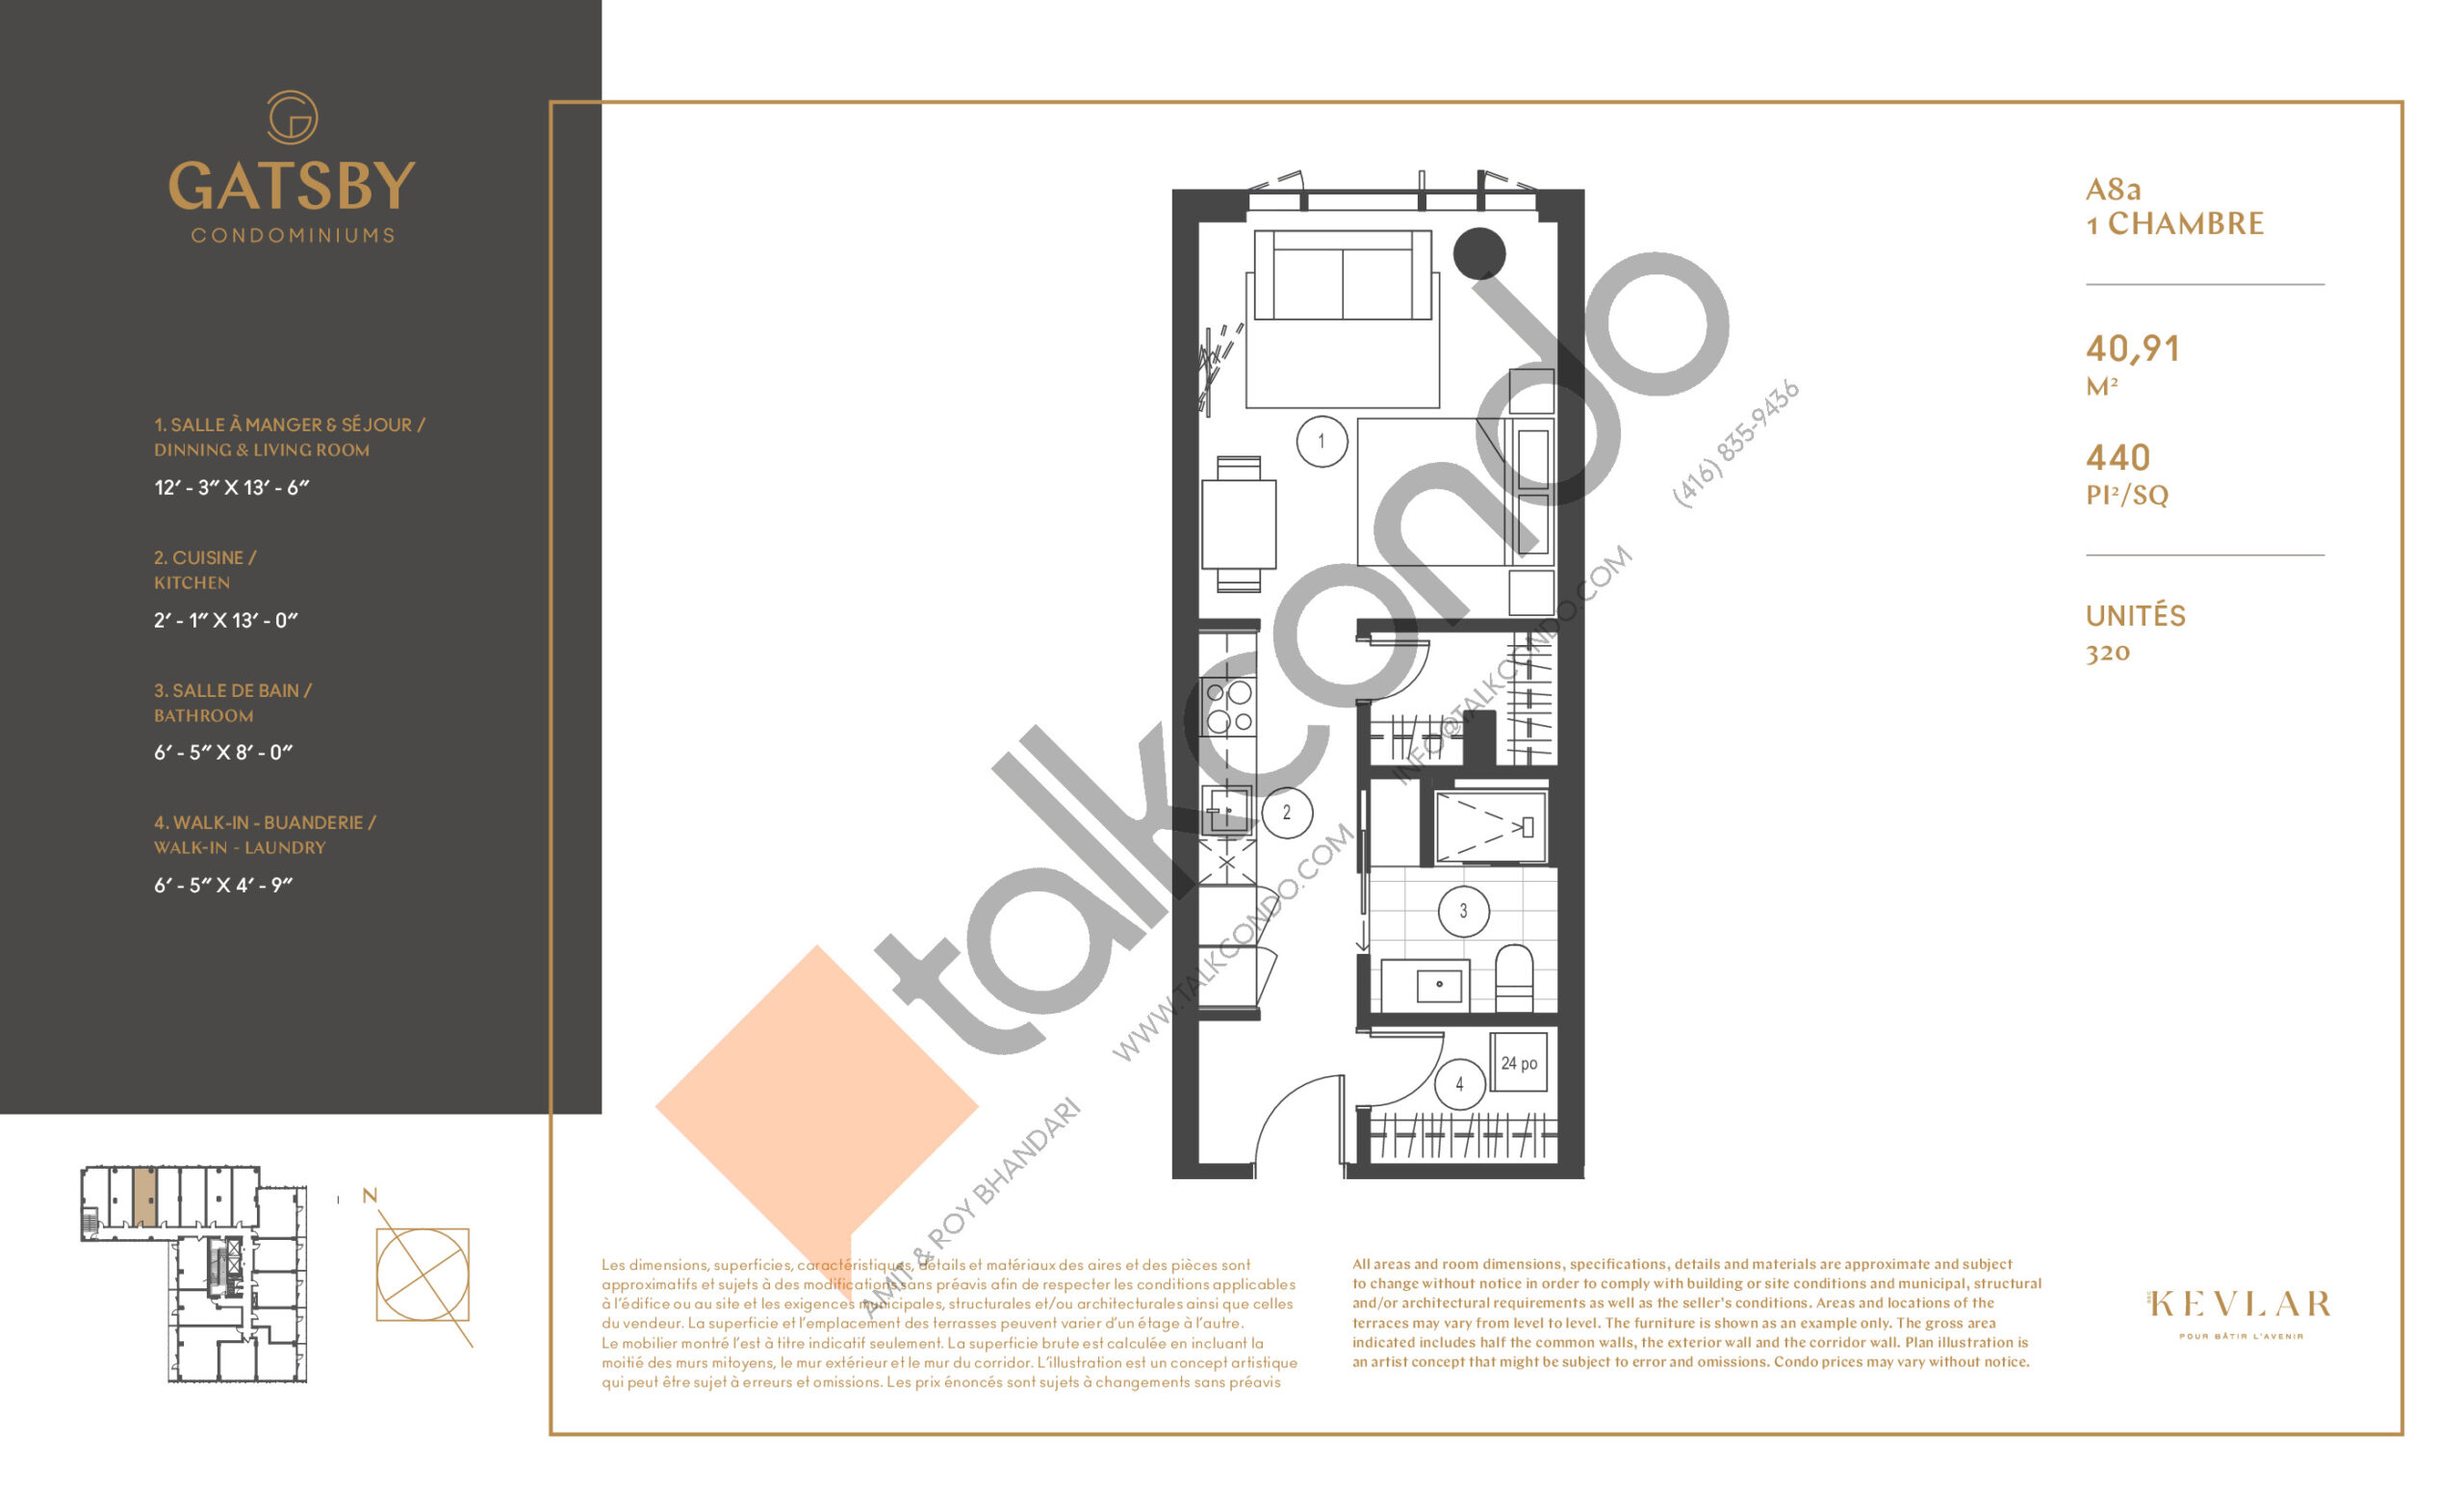 A8a Floor Plan at Gatsby Condos - 440 sq.ft